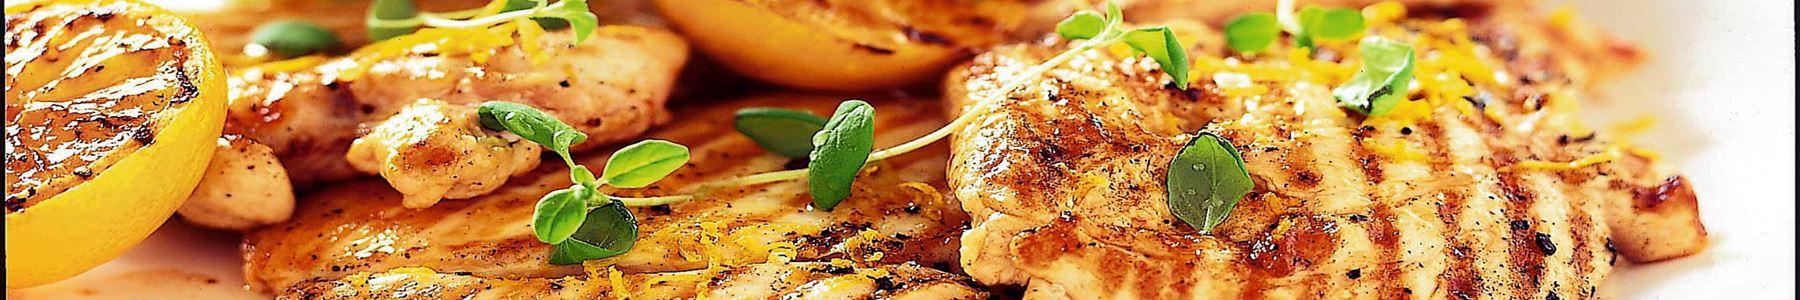 Avokado + Baguette + Grillad